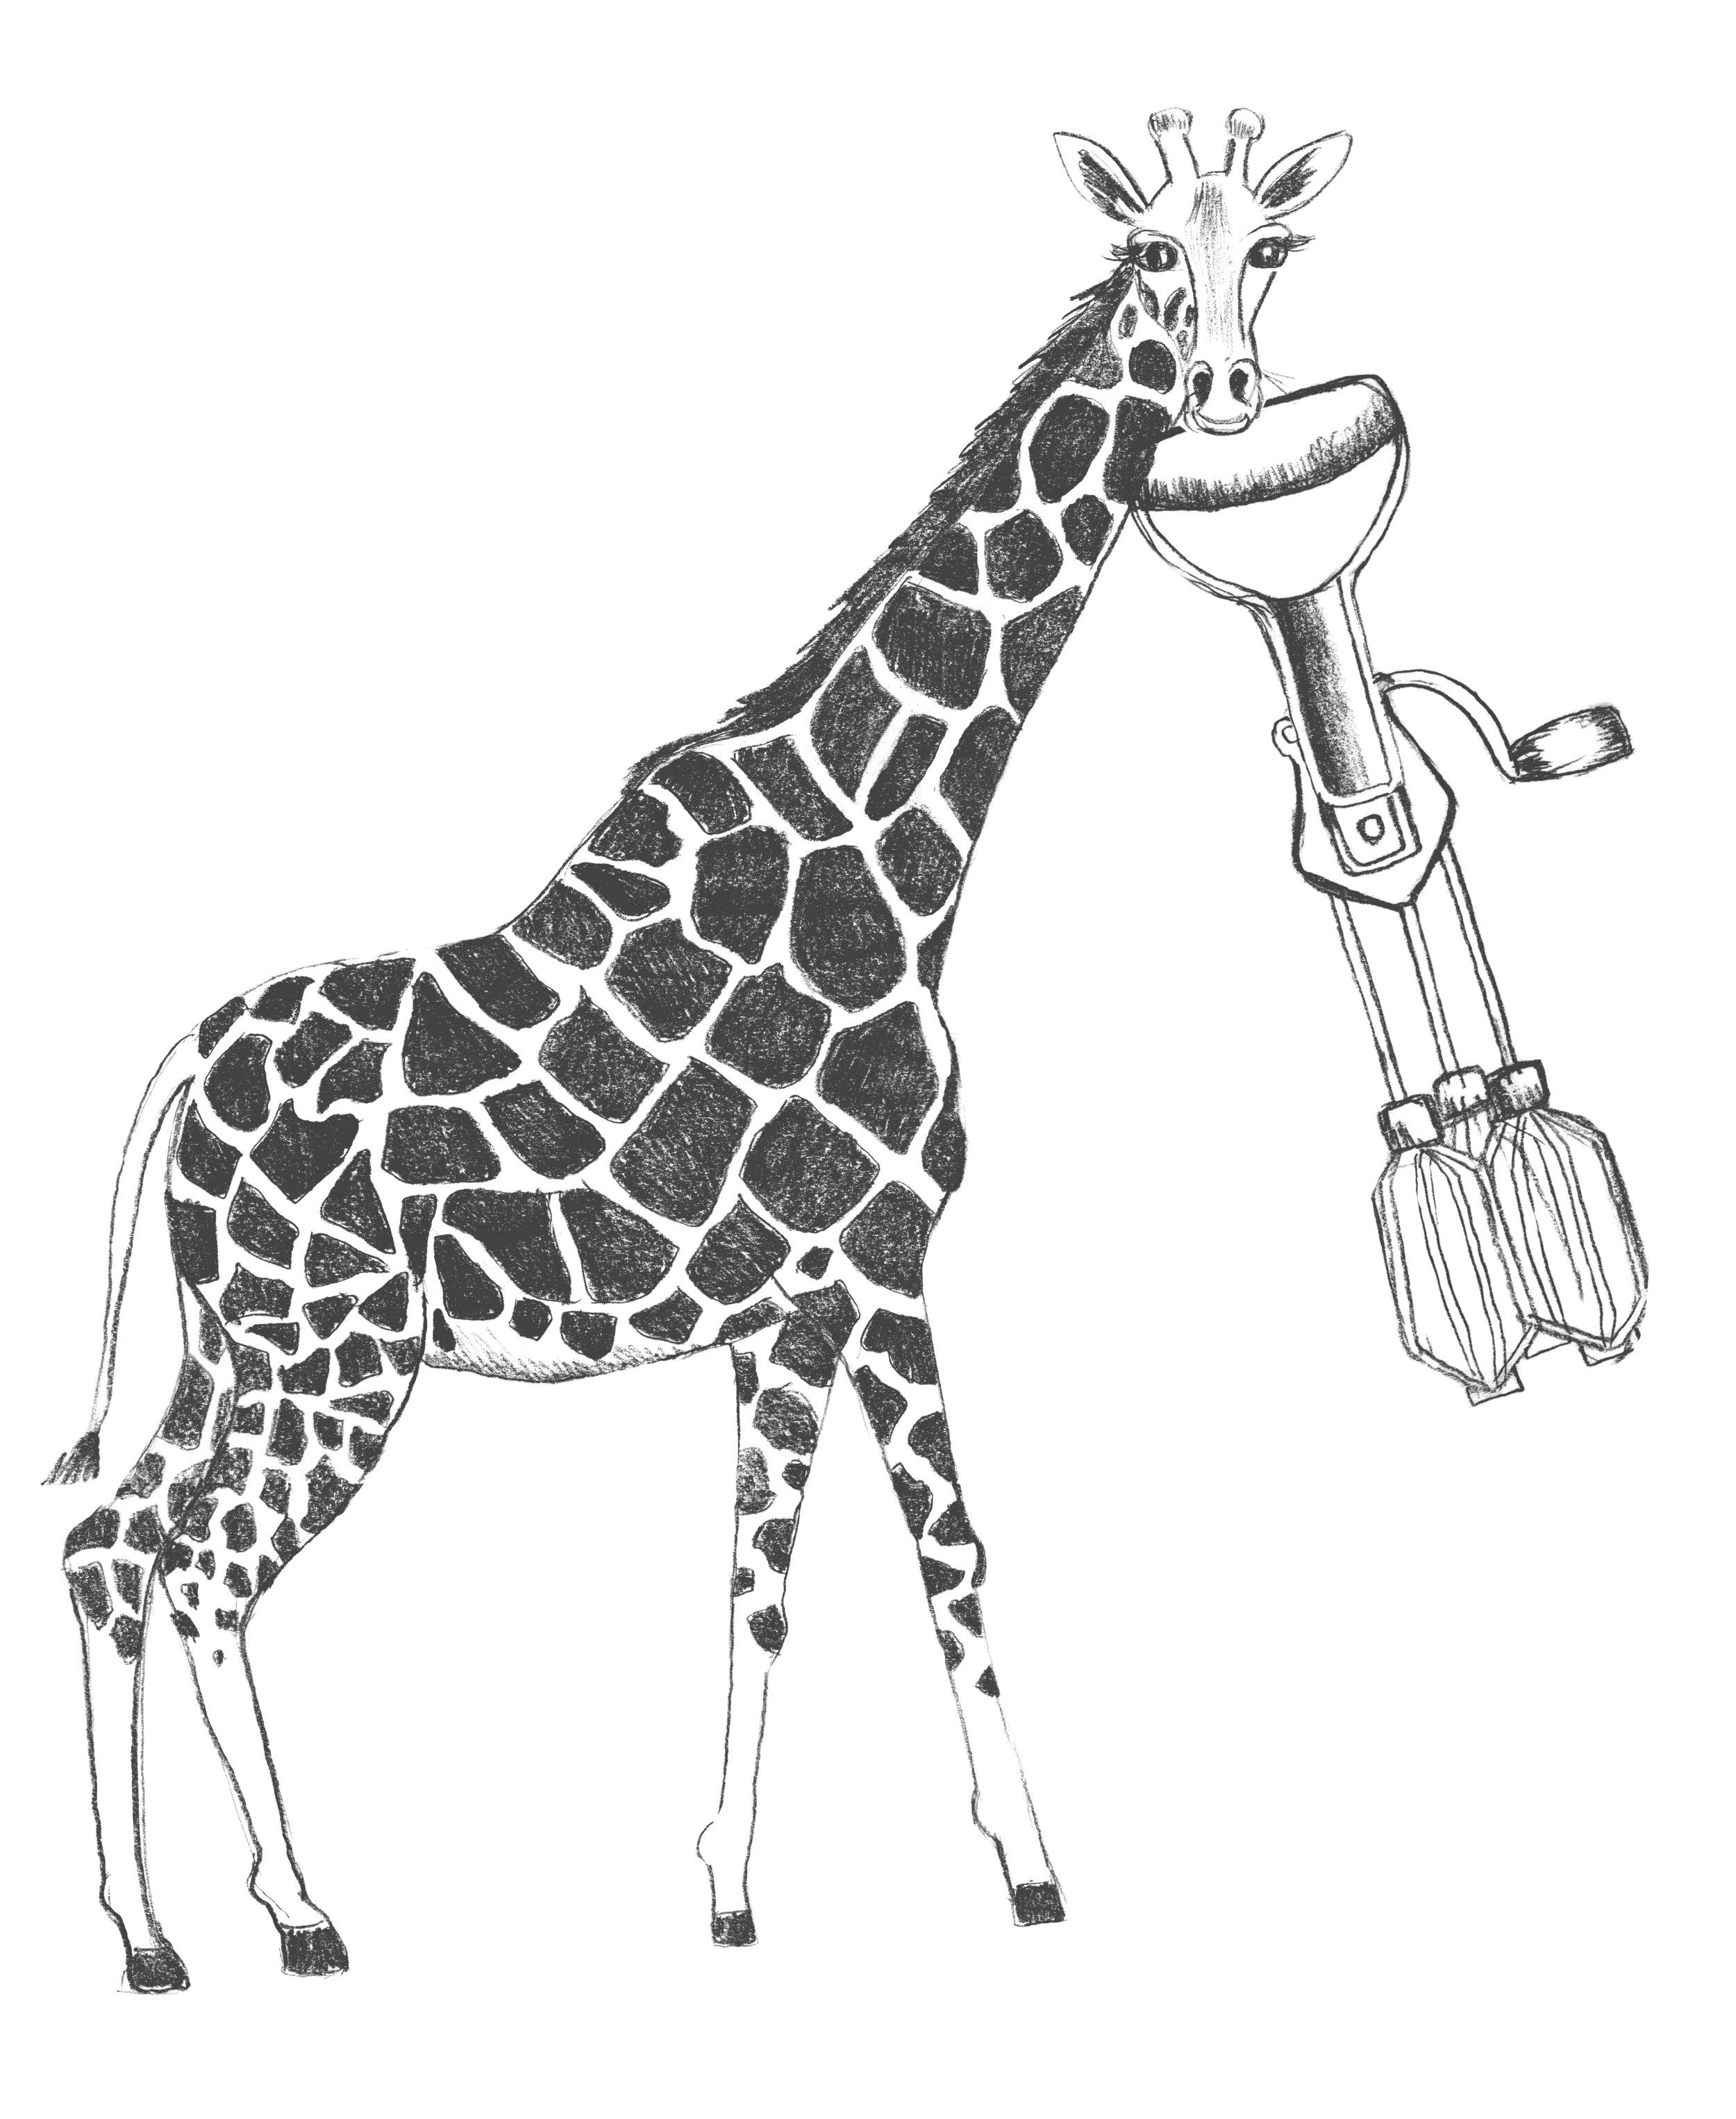 Pots&Co_Giraffe_80K_PR01.jpg